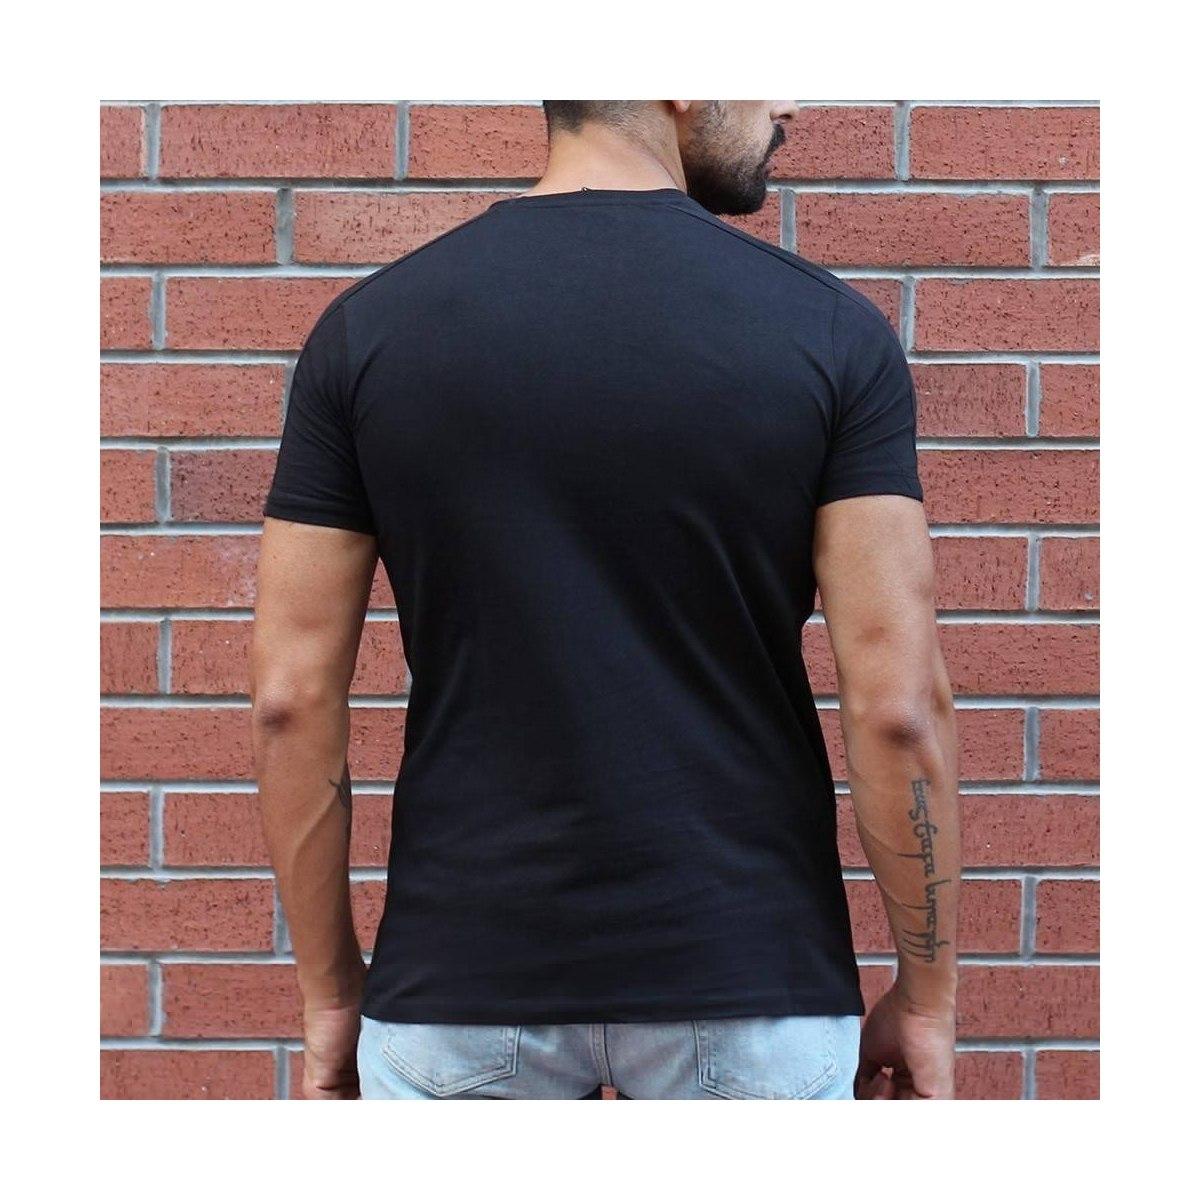 Men's Round Neck Stylish Basic T-Shirt Black Mv Premium Brand - 1